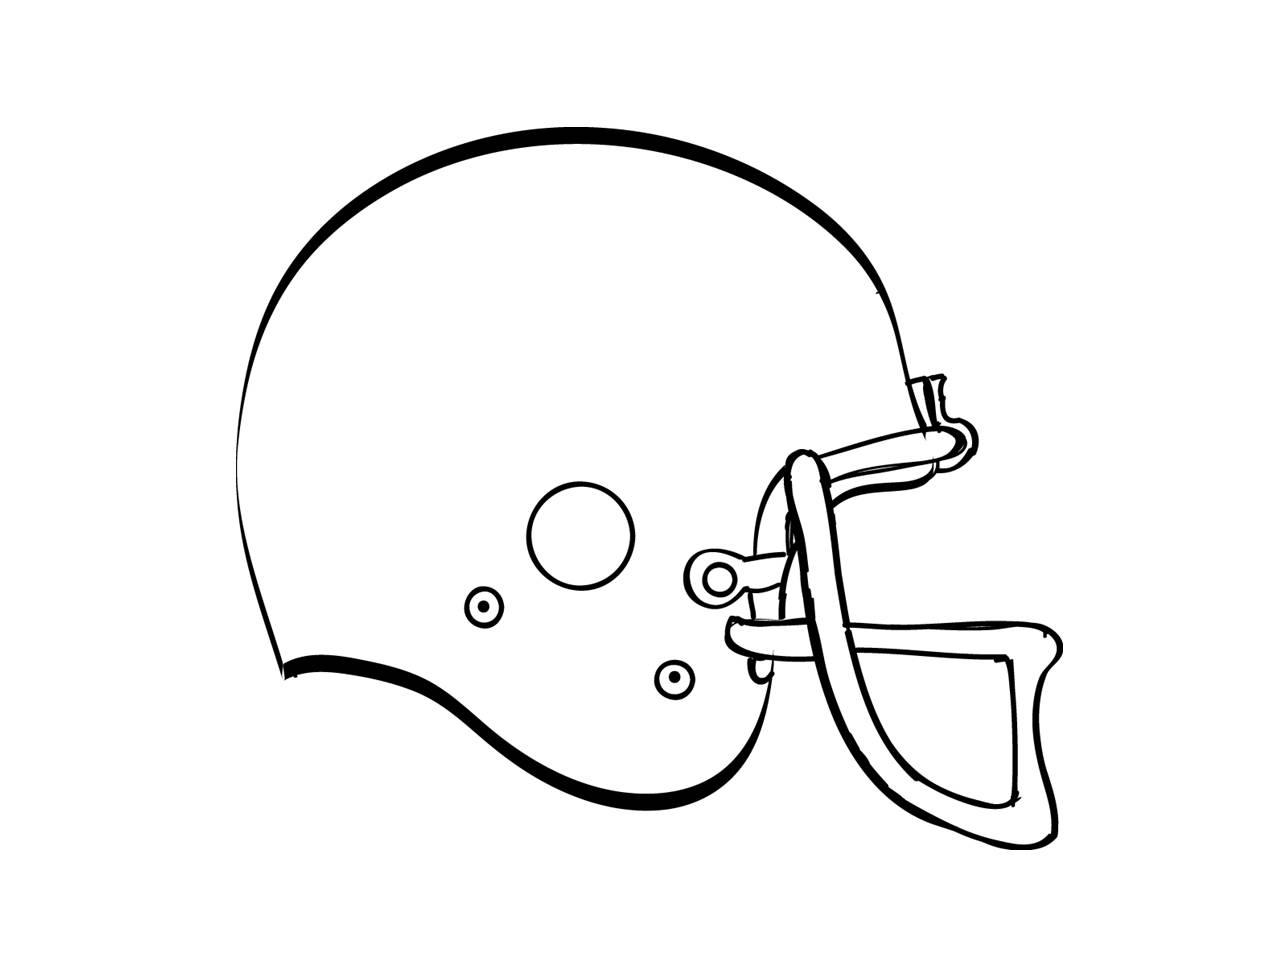 1278x959 Football Helmet Clip Art Free Clipart Images Image 2